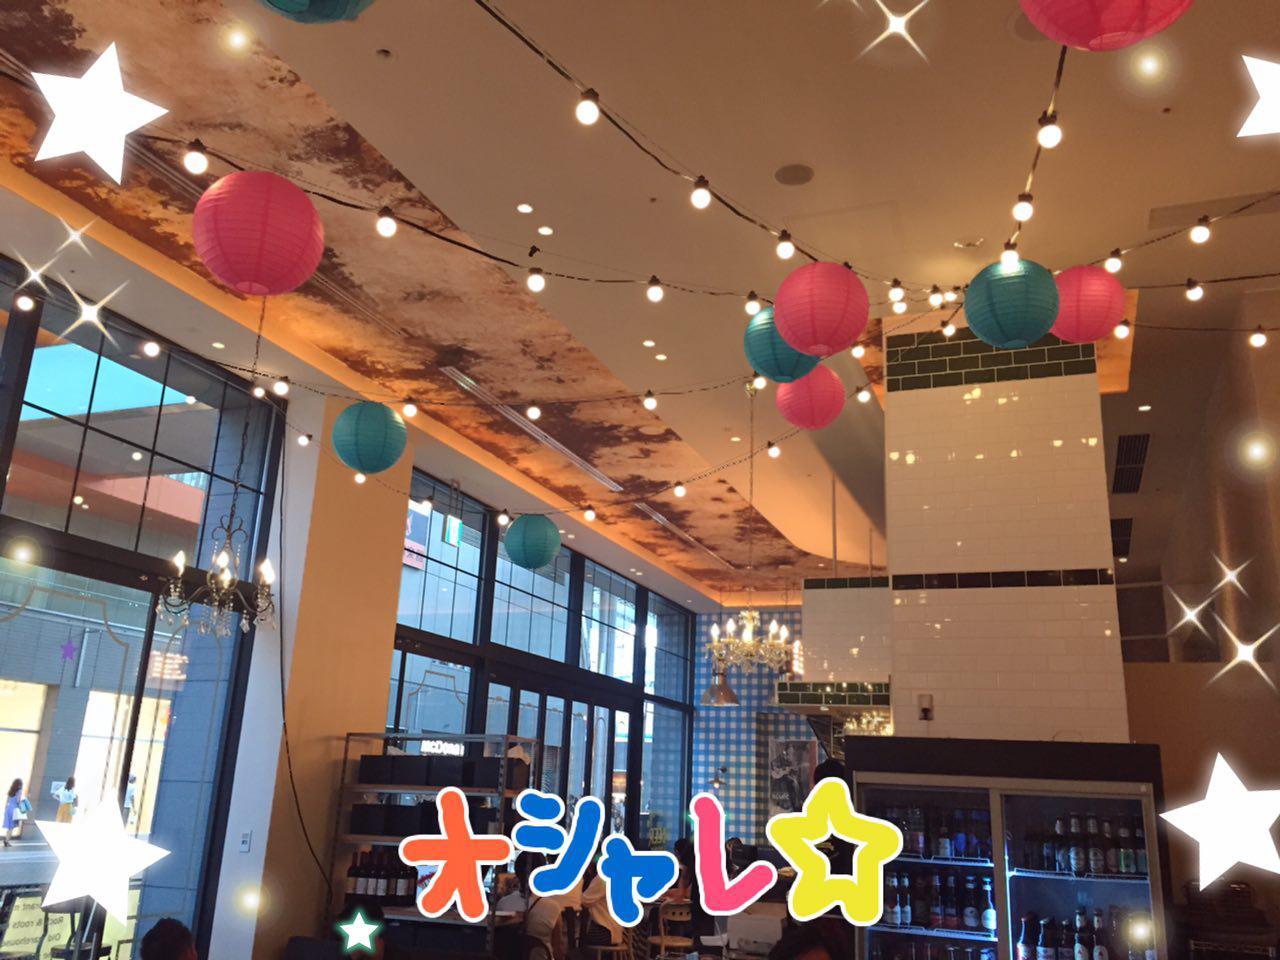 photo_2017-08-07_23-54-01.jpg